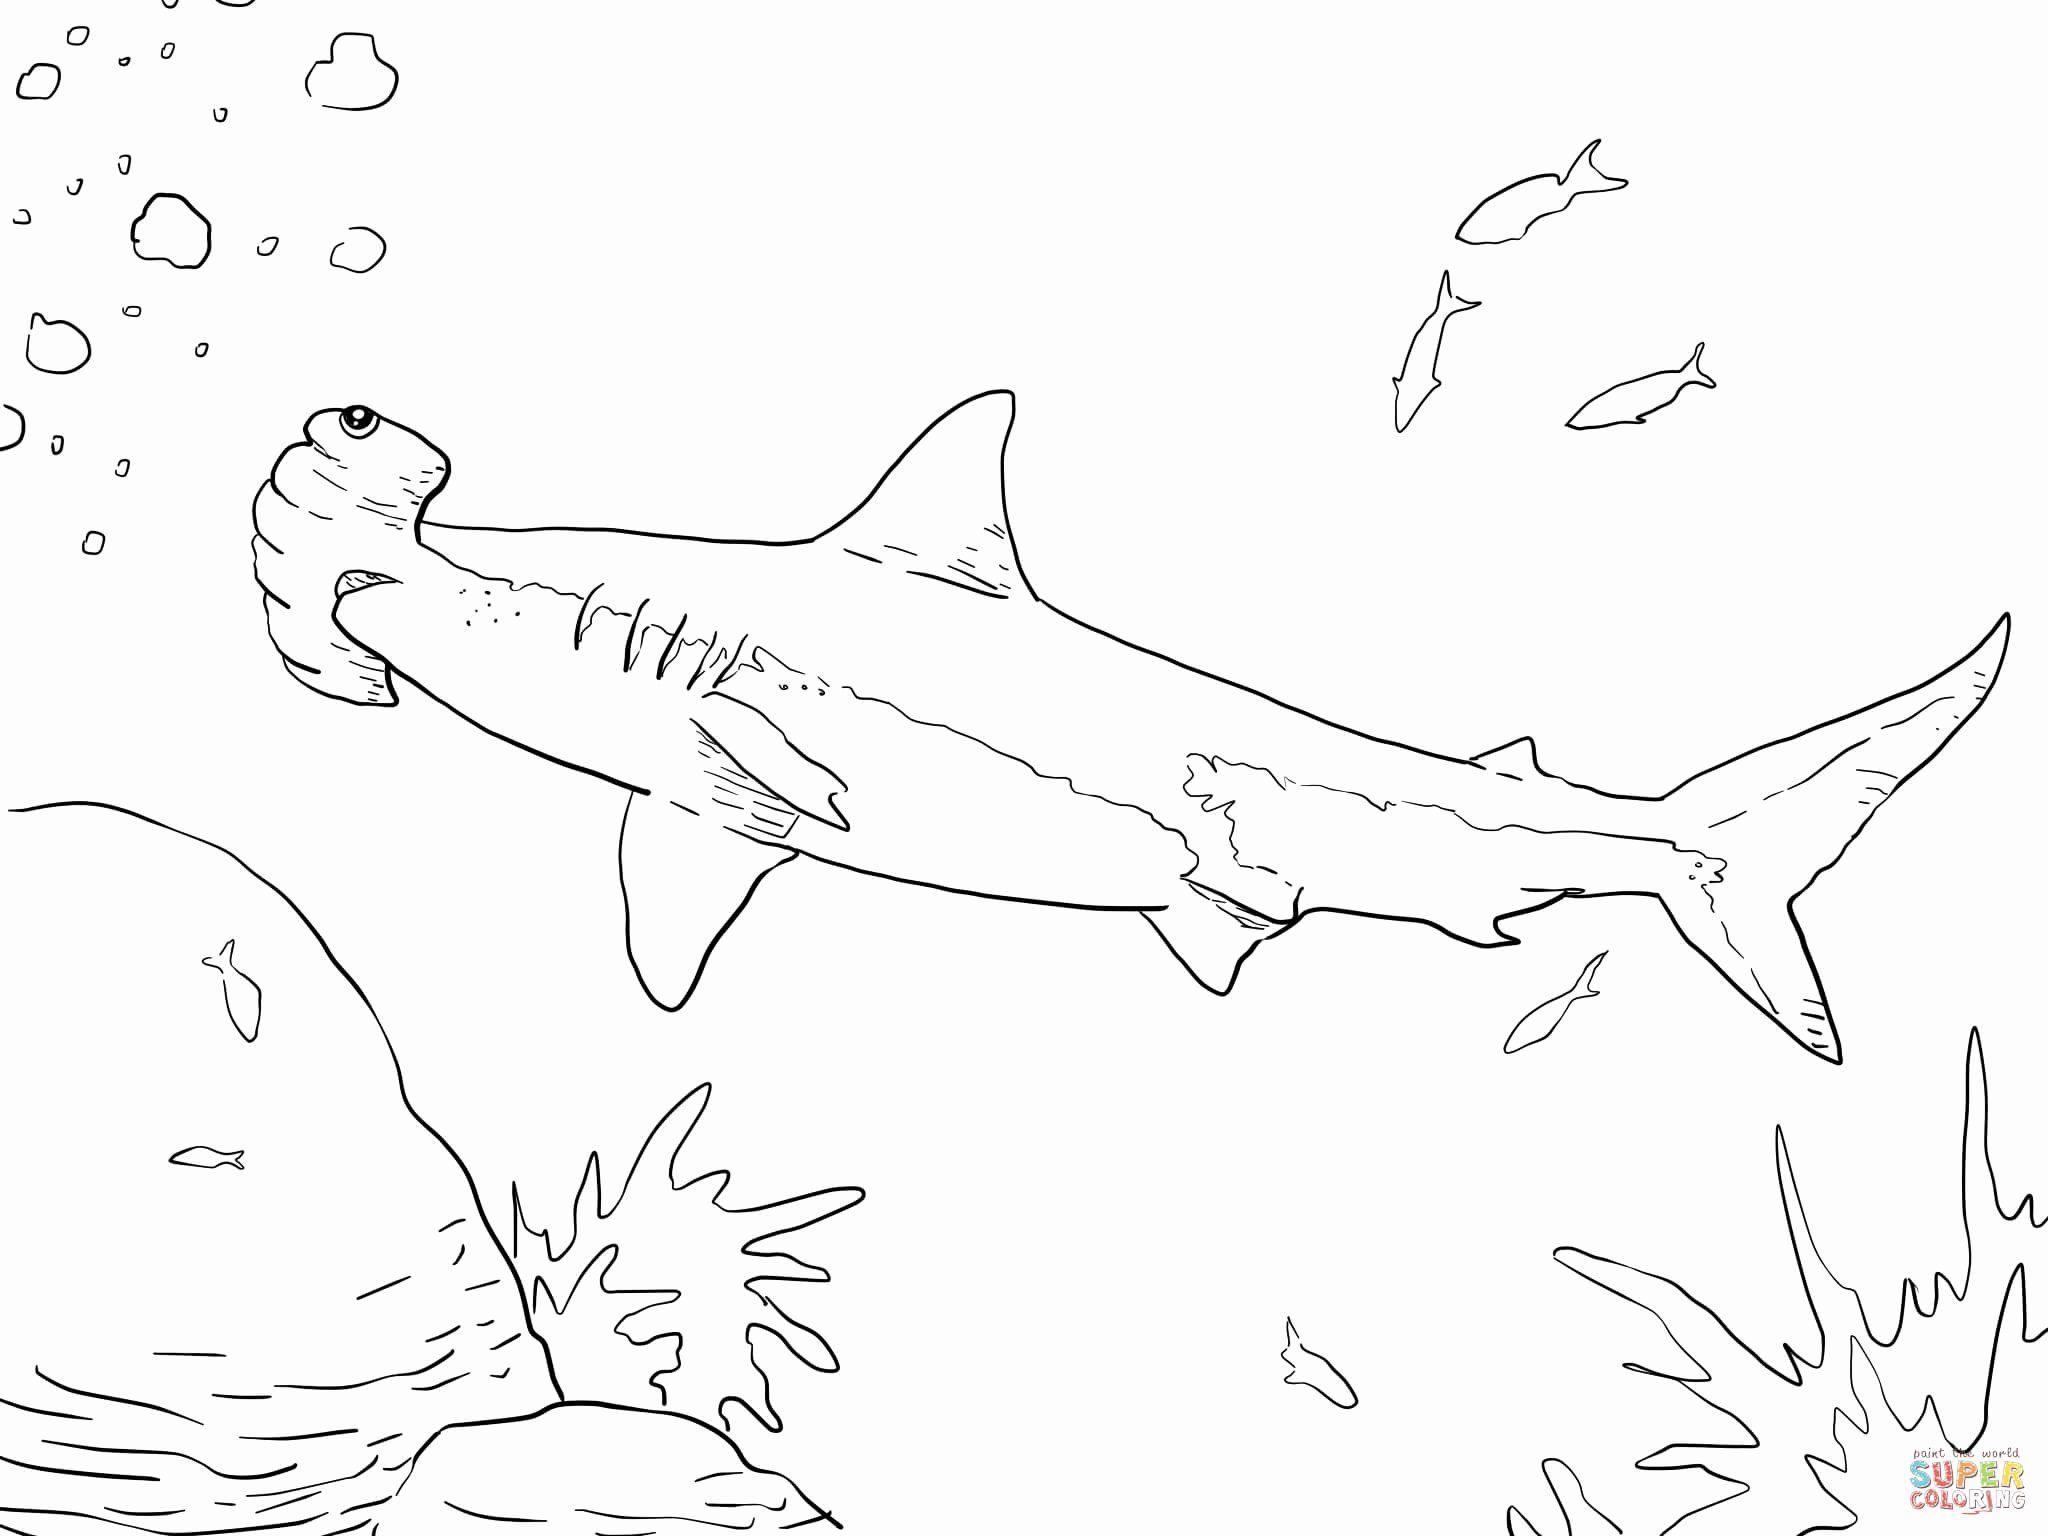 Hammerhead Shark Coloring Page New Hammerhead Shark To Print In 2020 Shark Coloring Pages Free Printable Coloring Pages Fish Coloring Page